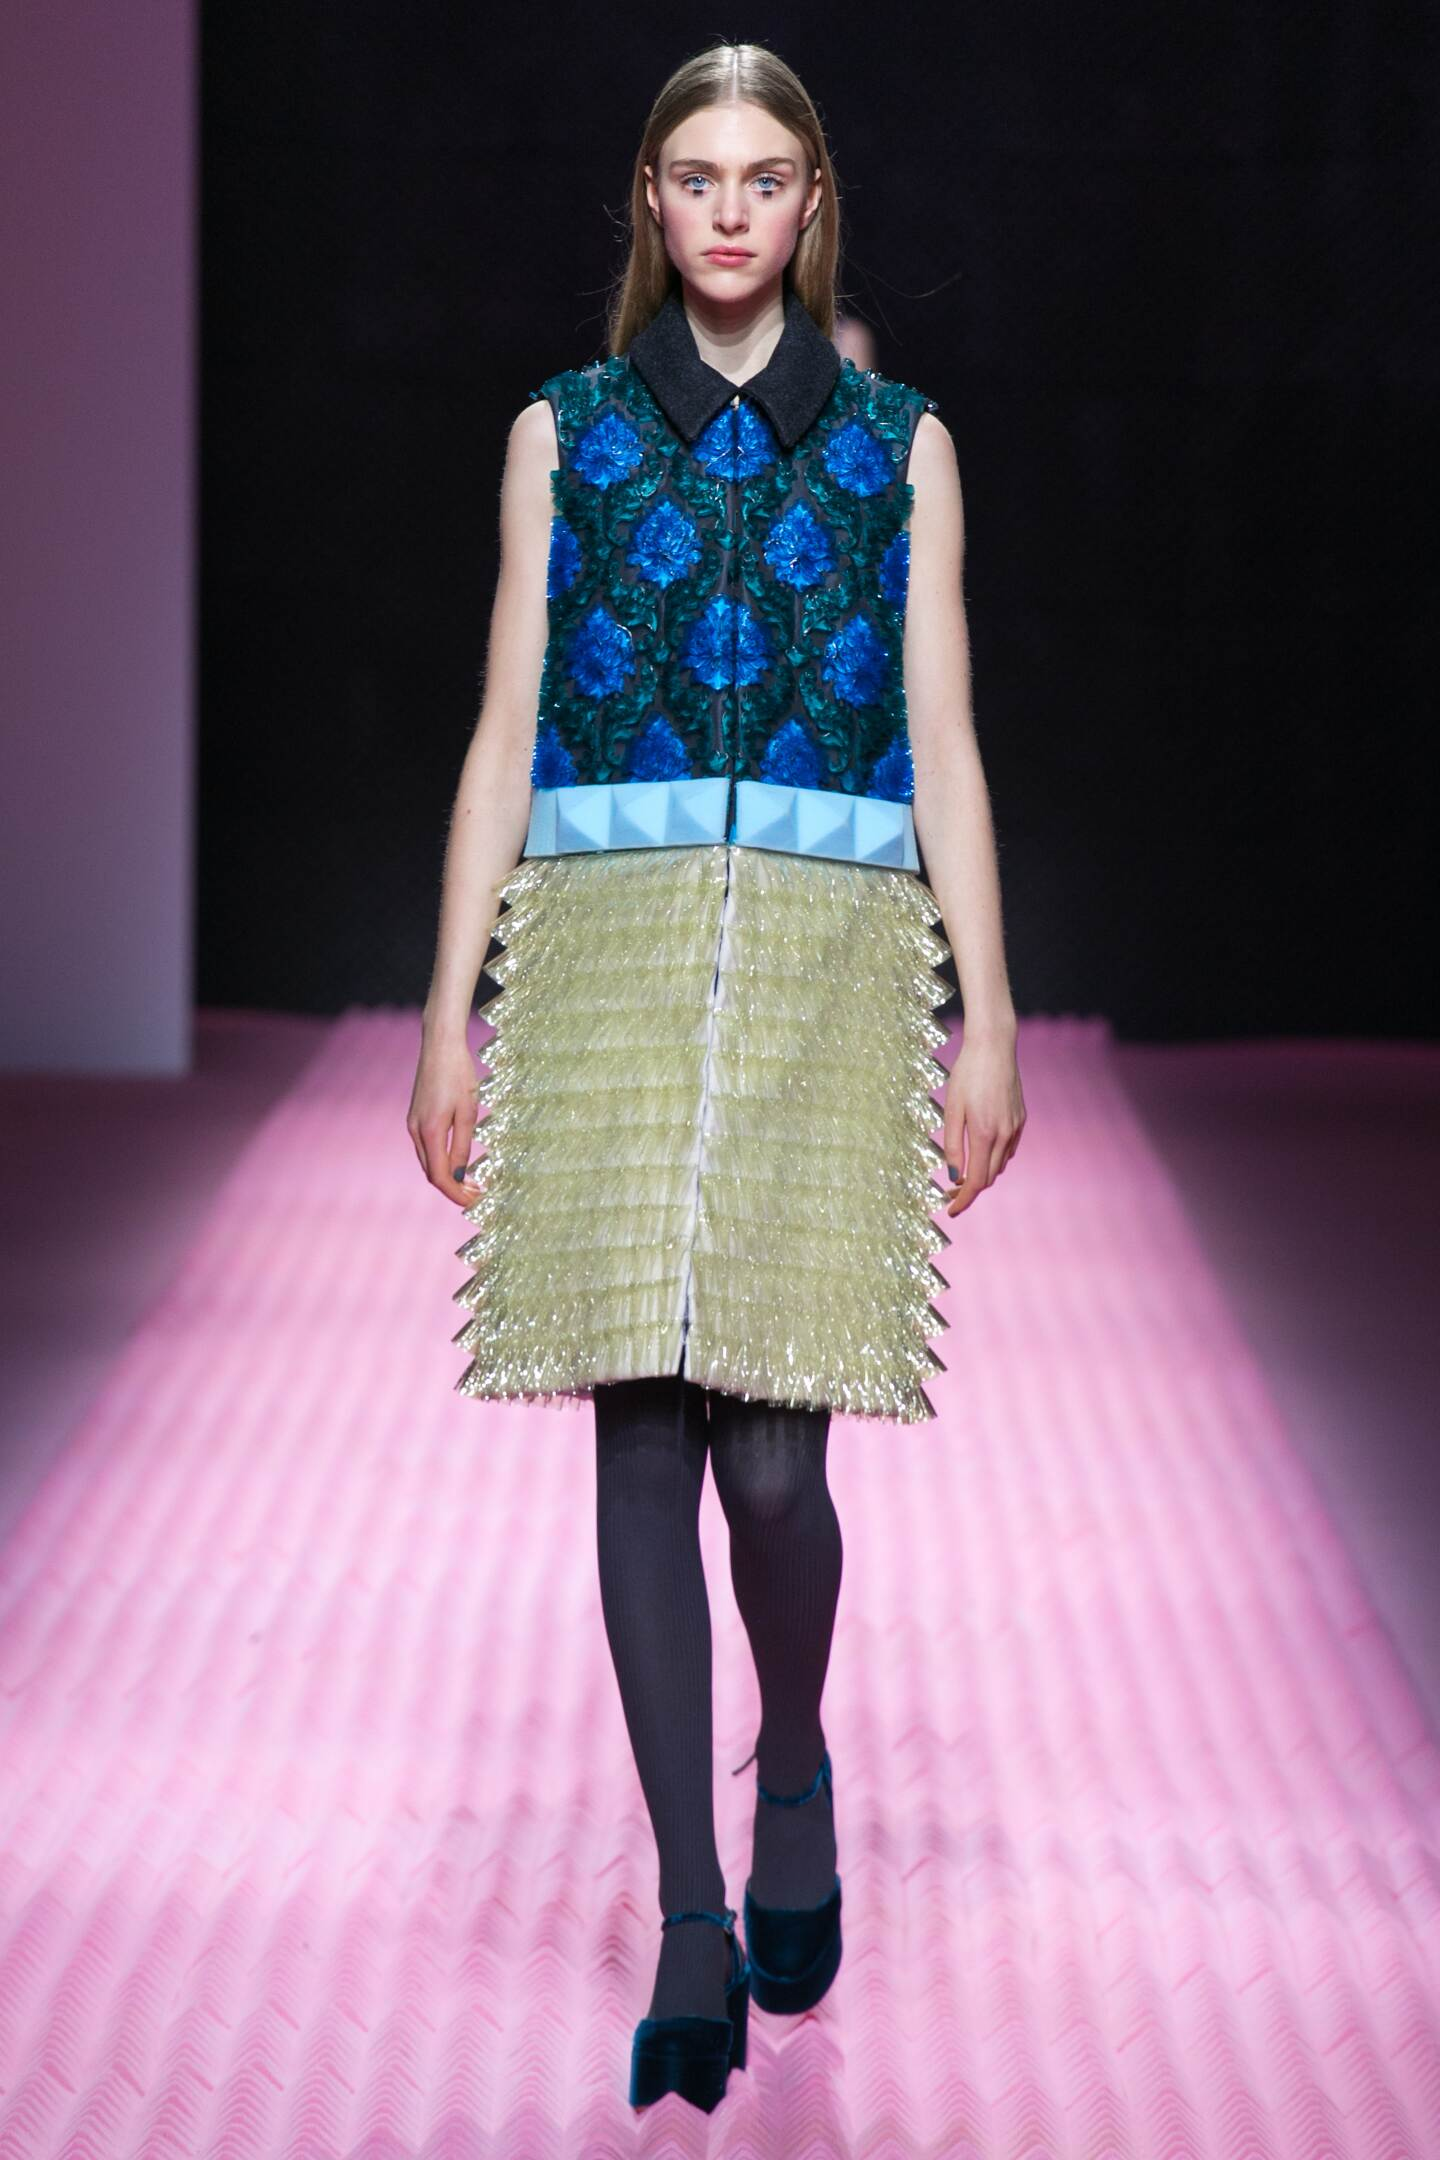 Fashion Woman Model Mary Katrantzou Collection Catwalk